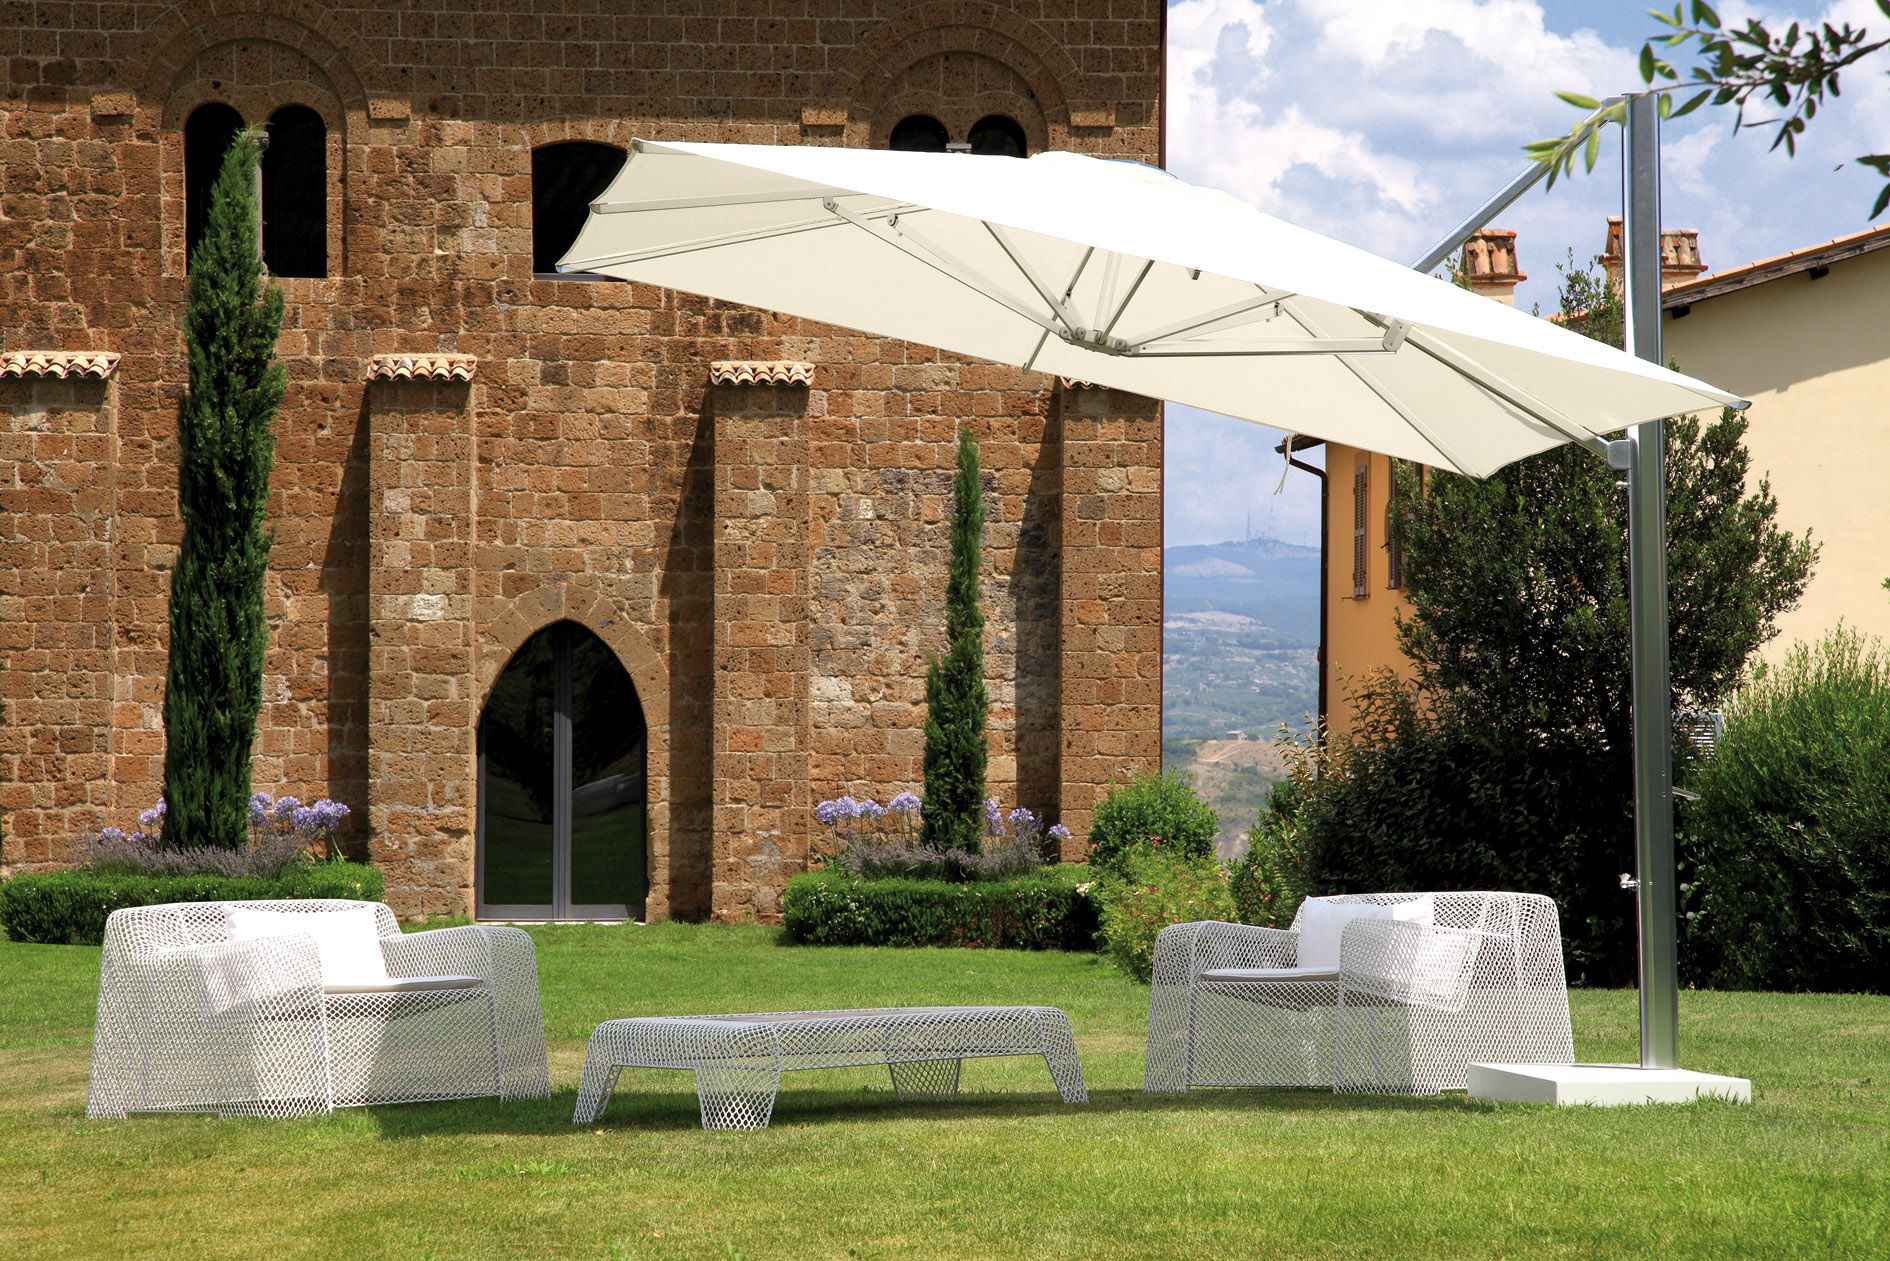 Parasol d port shade emu toile blanche m t alu base blanche h 280 x 300 made in design - Blanche porte suivi de colis ...